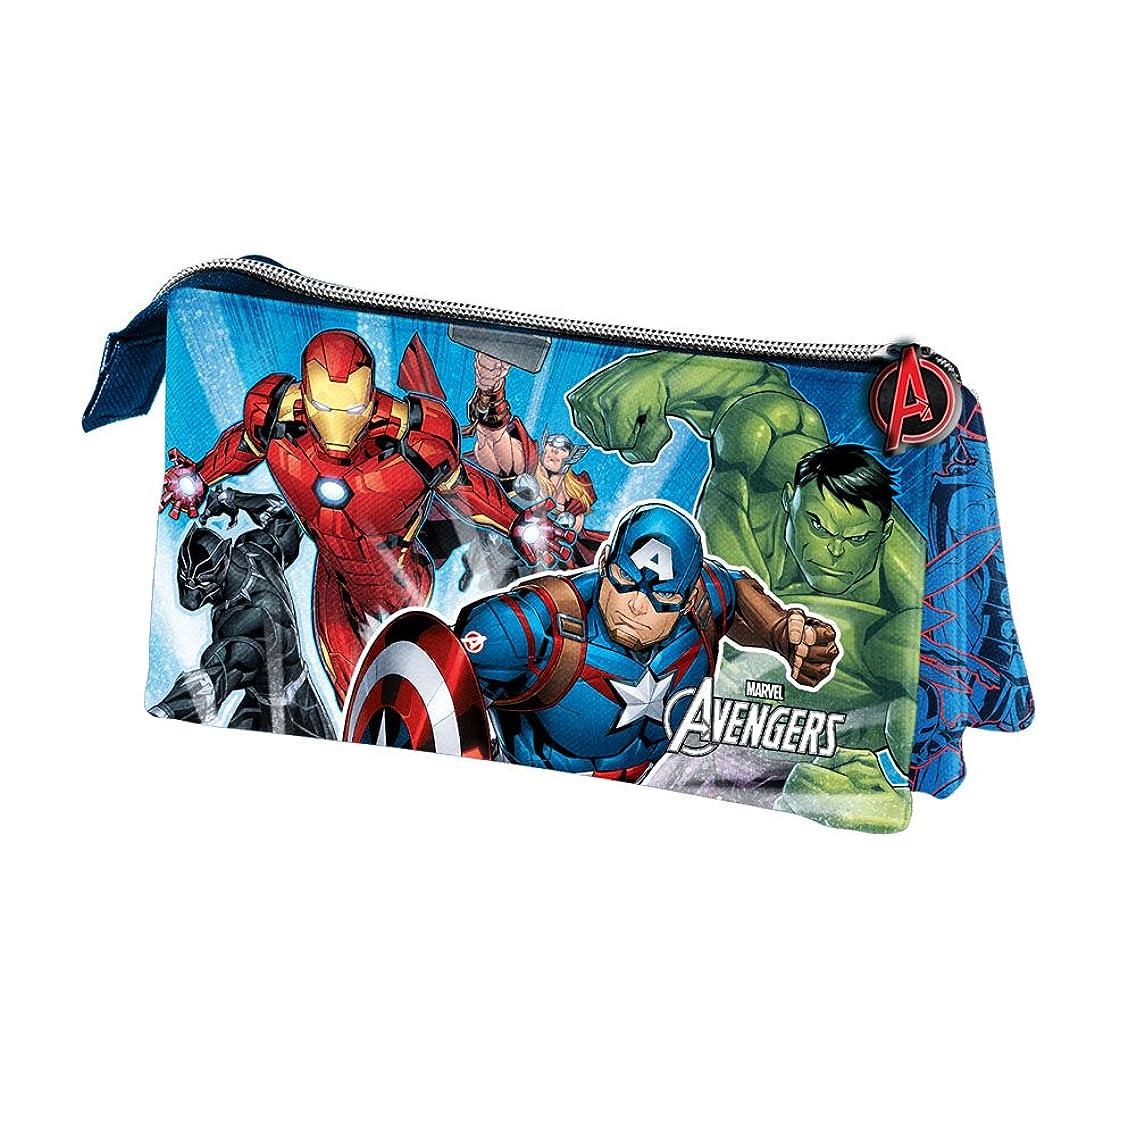 Karactermania The Avengers Powerful-Triple Pencil Cases, 23 cm, Blue